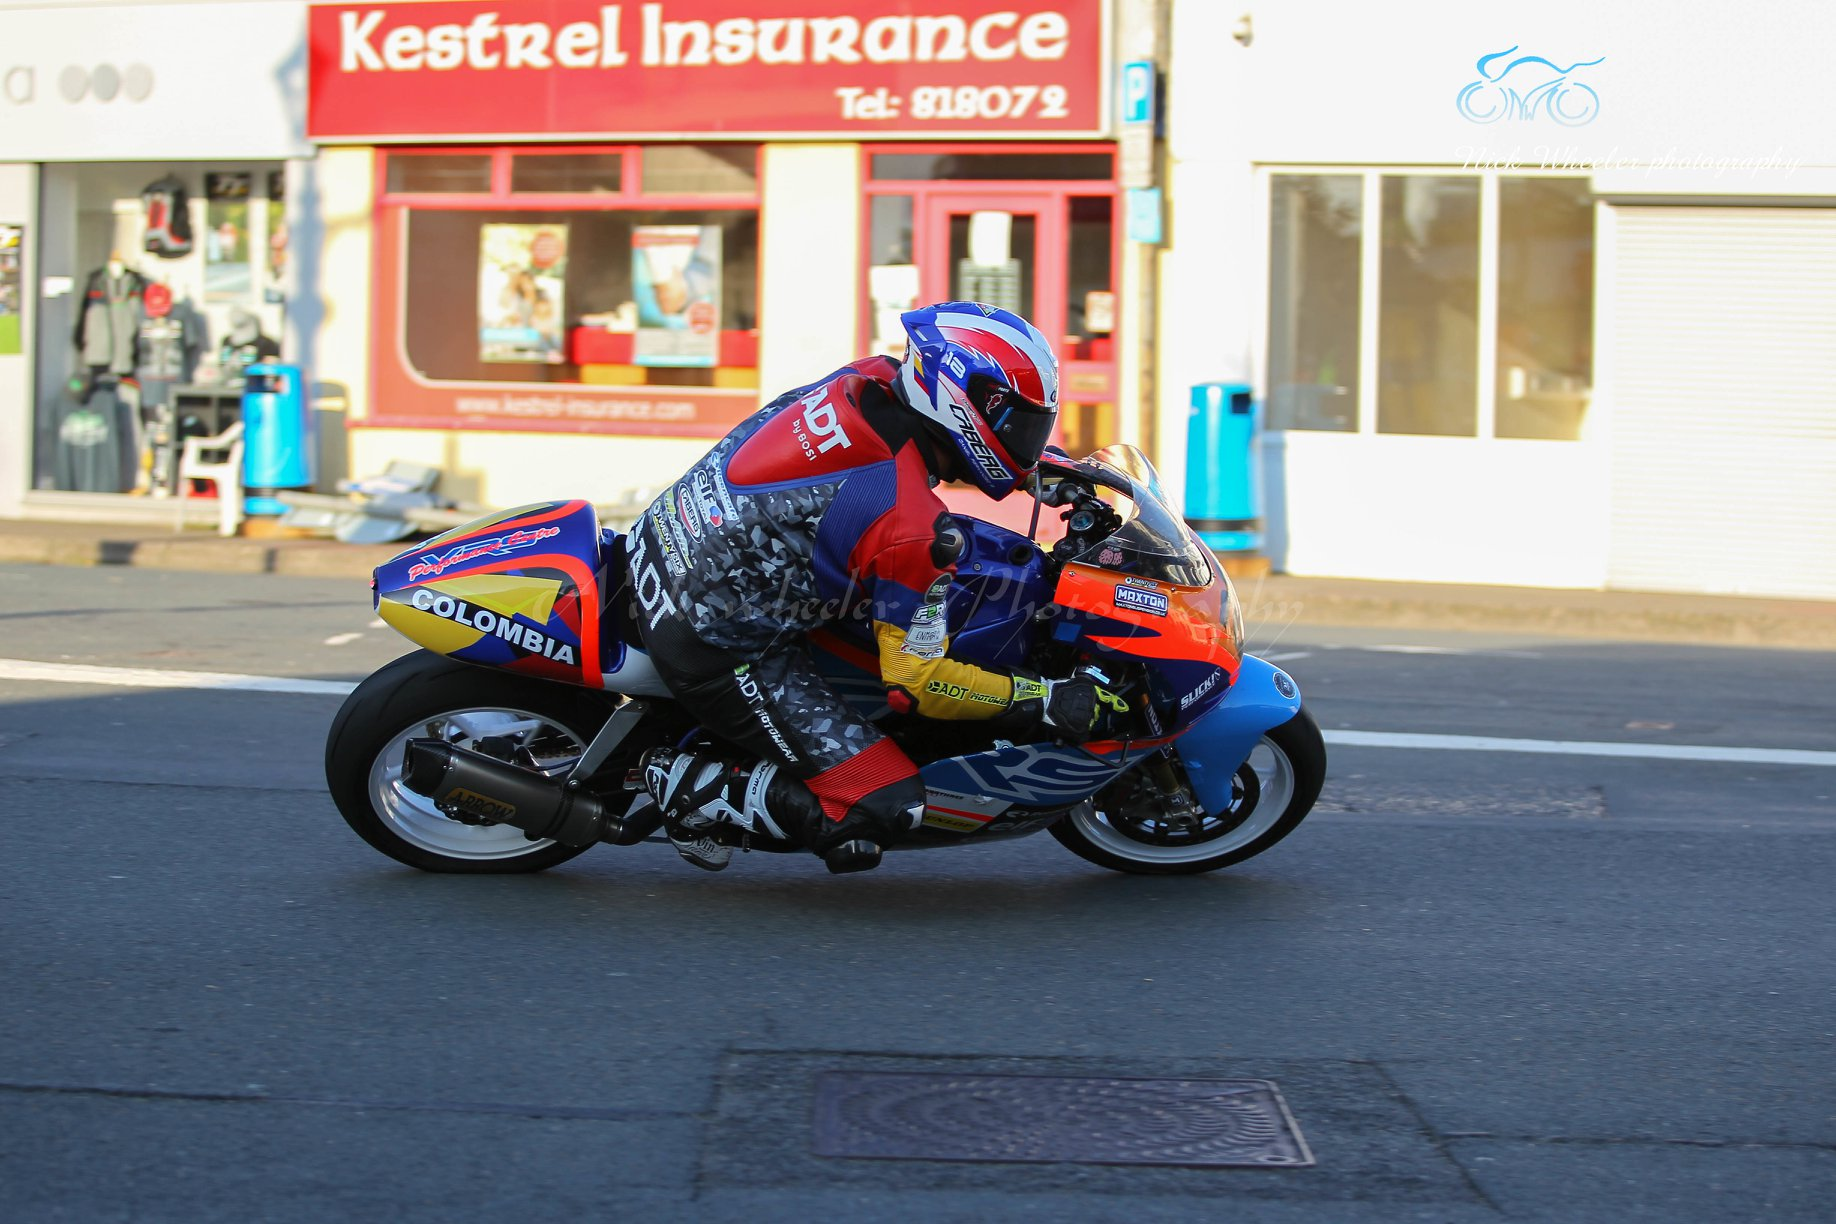 Manx GP Top 6: Daniel Fernandez